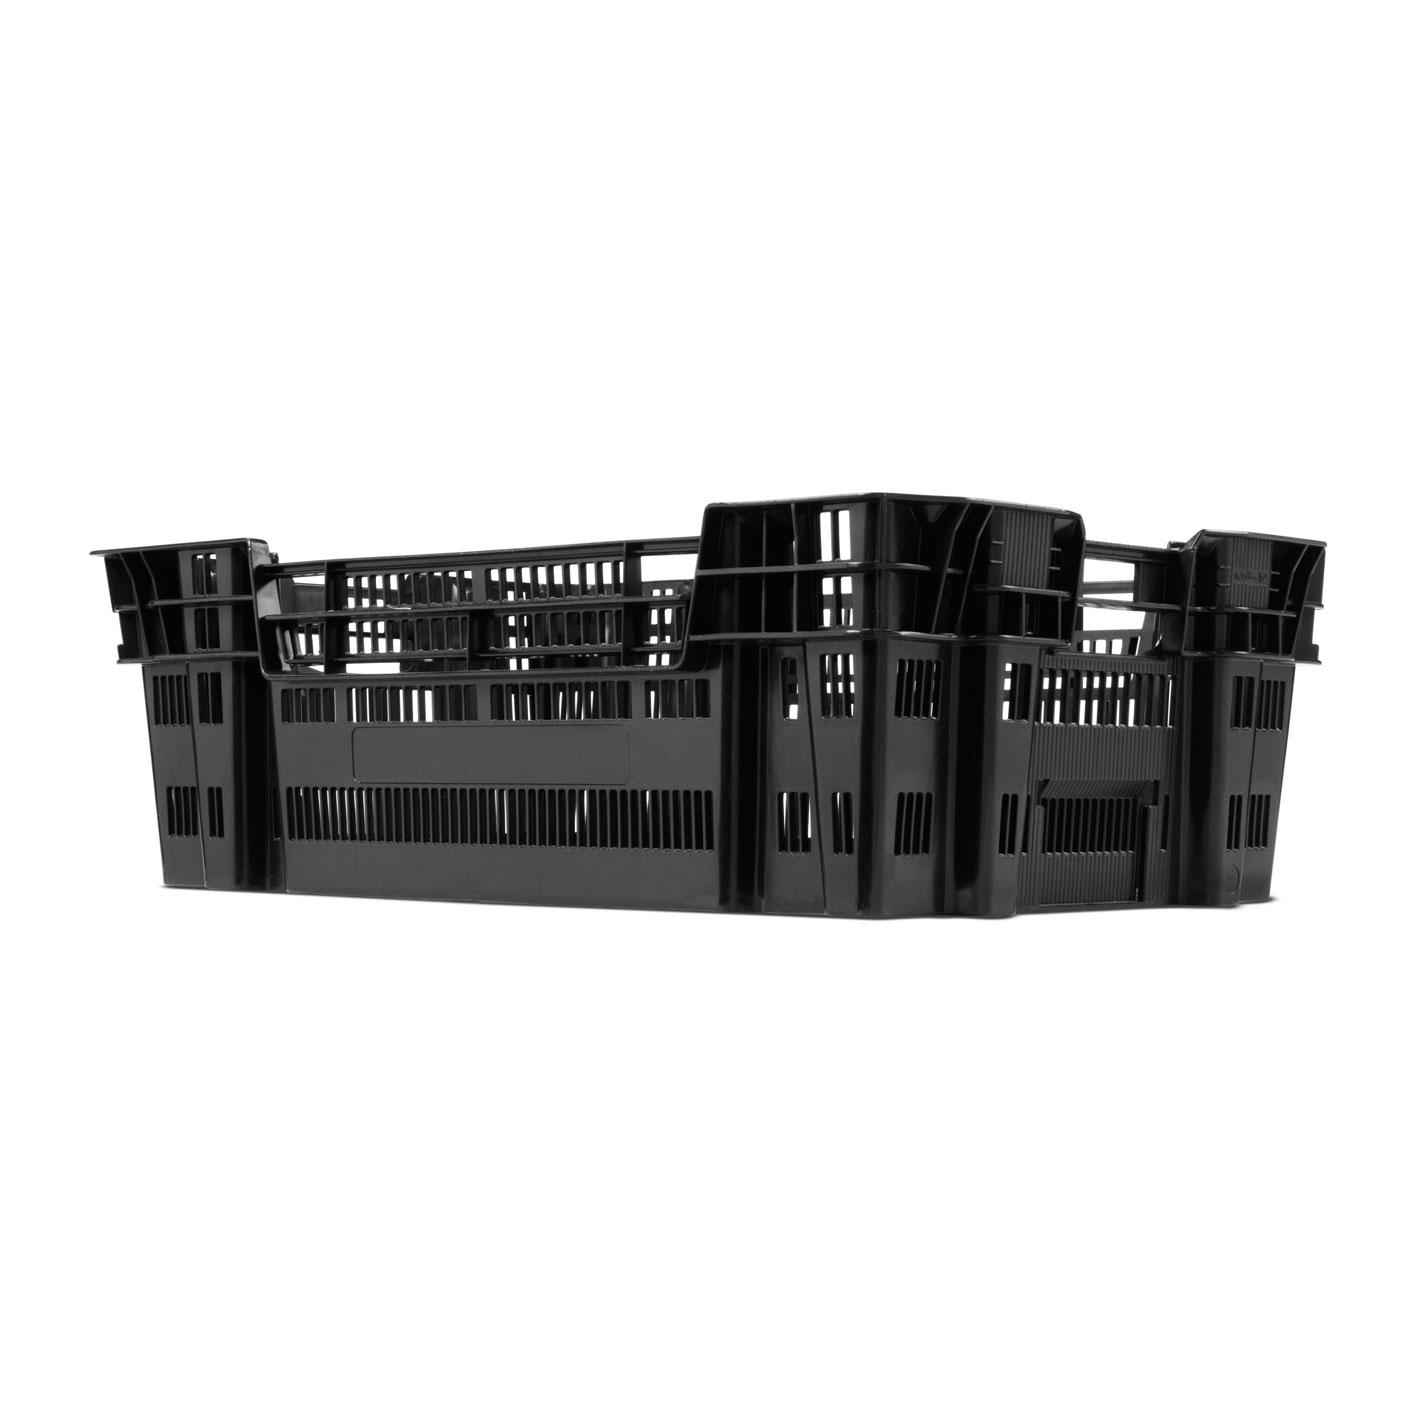 34 liter draai-stapel-nestbare kist